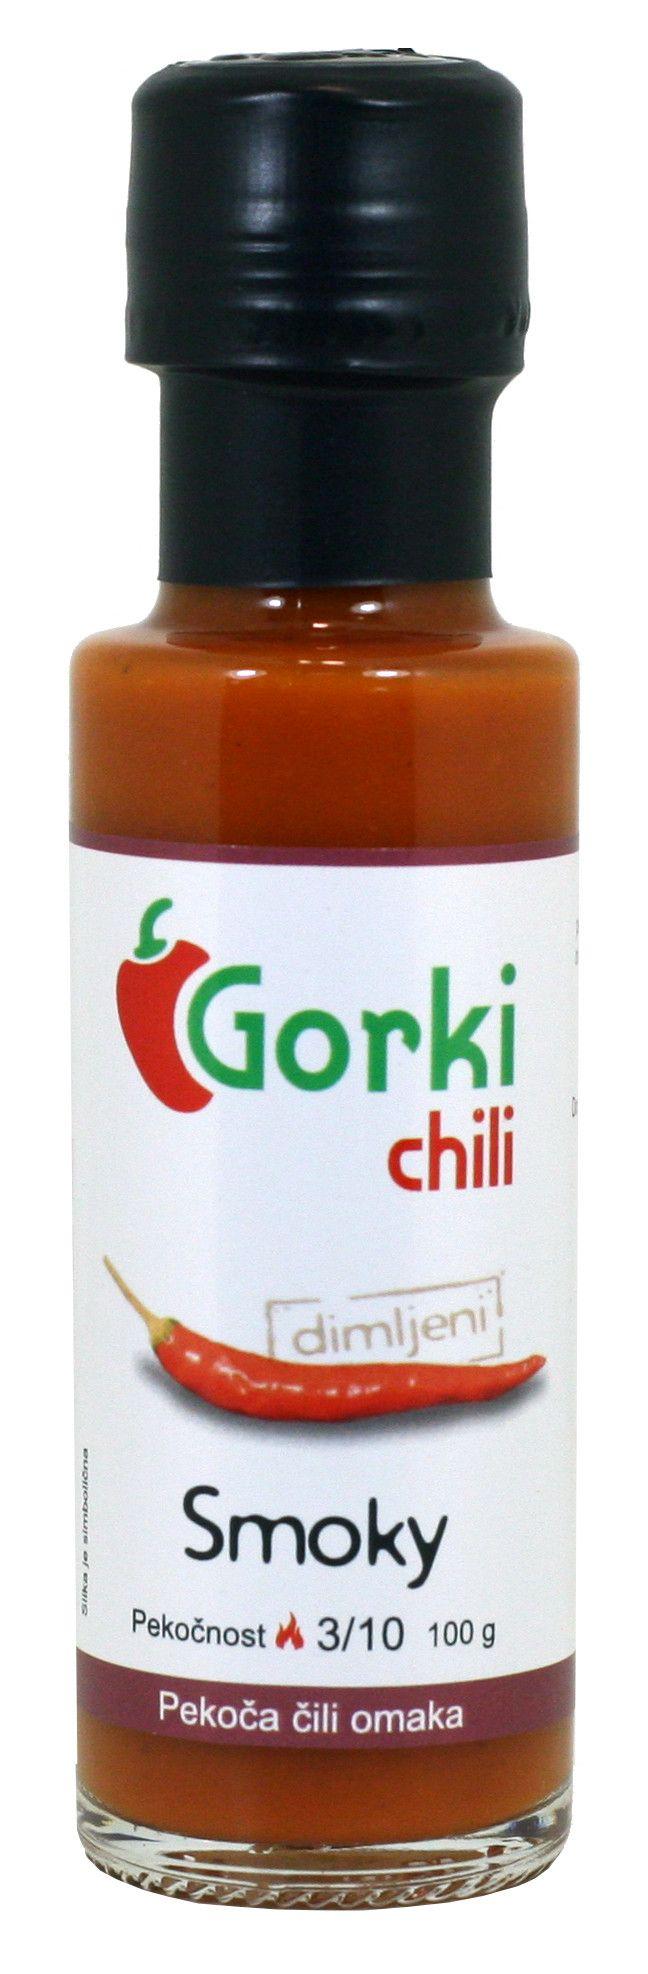 GORKI CHILI - SALSA PICCANTE SMOKY GR. 100